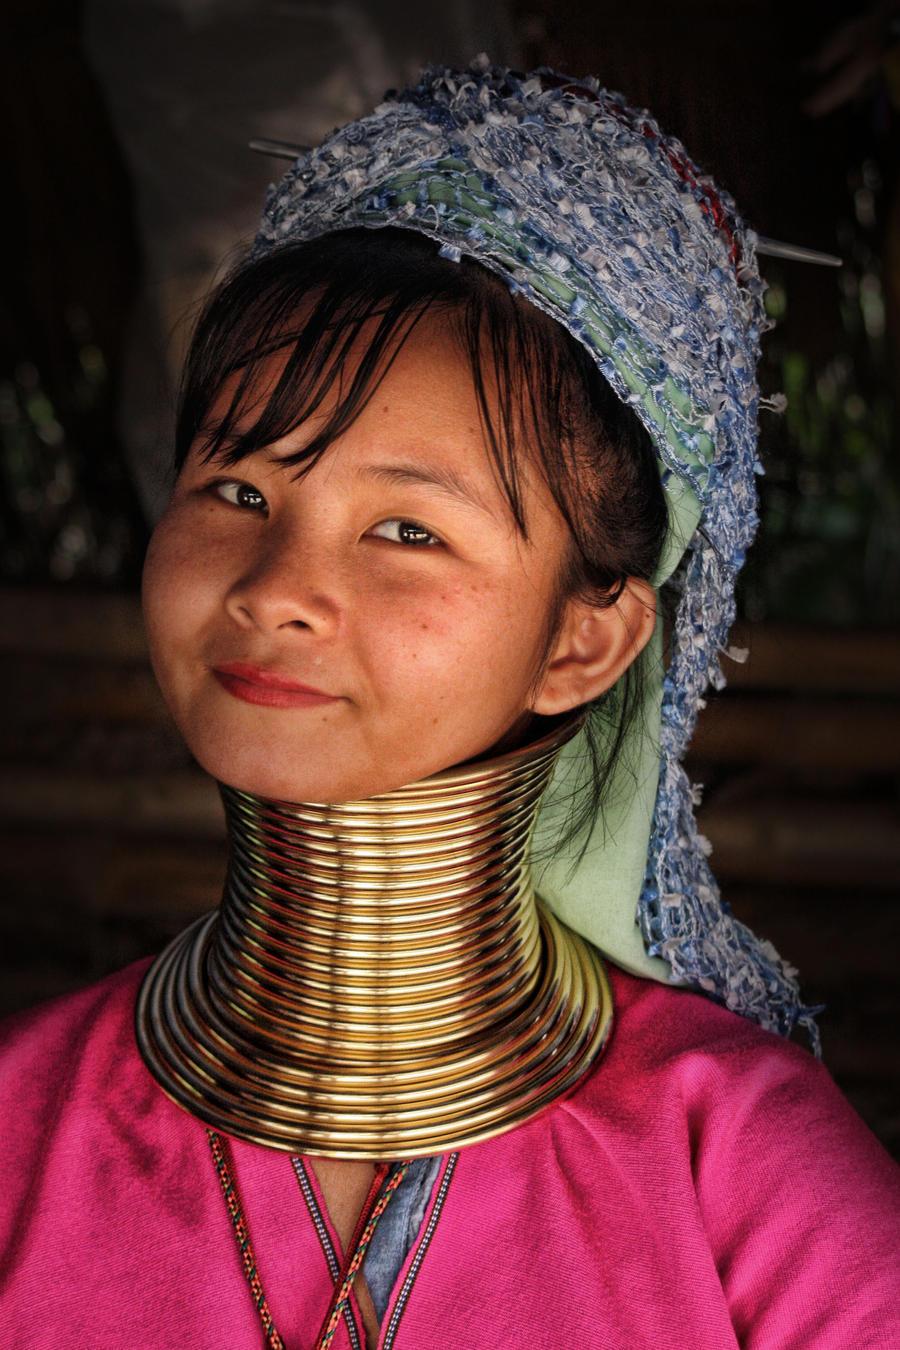 Long Neck Woman by stinebamse